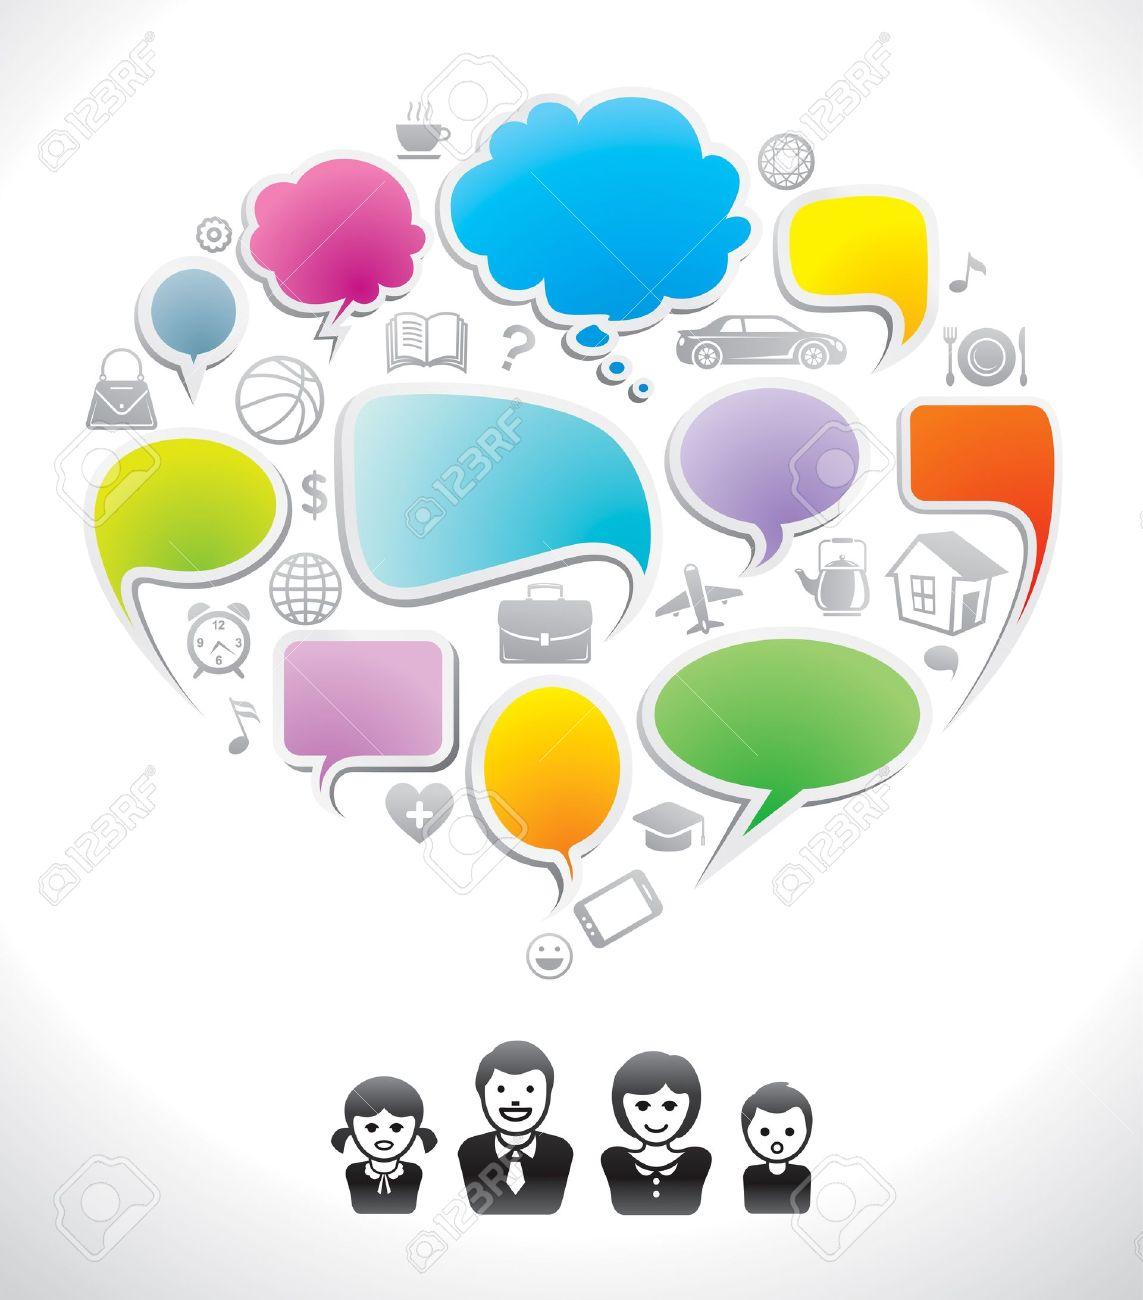 Family chat, communication speech icon, dialog, speak bubble - 14162581